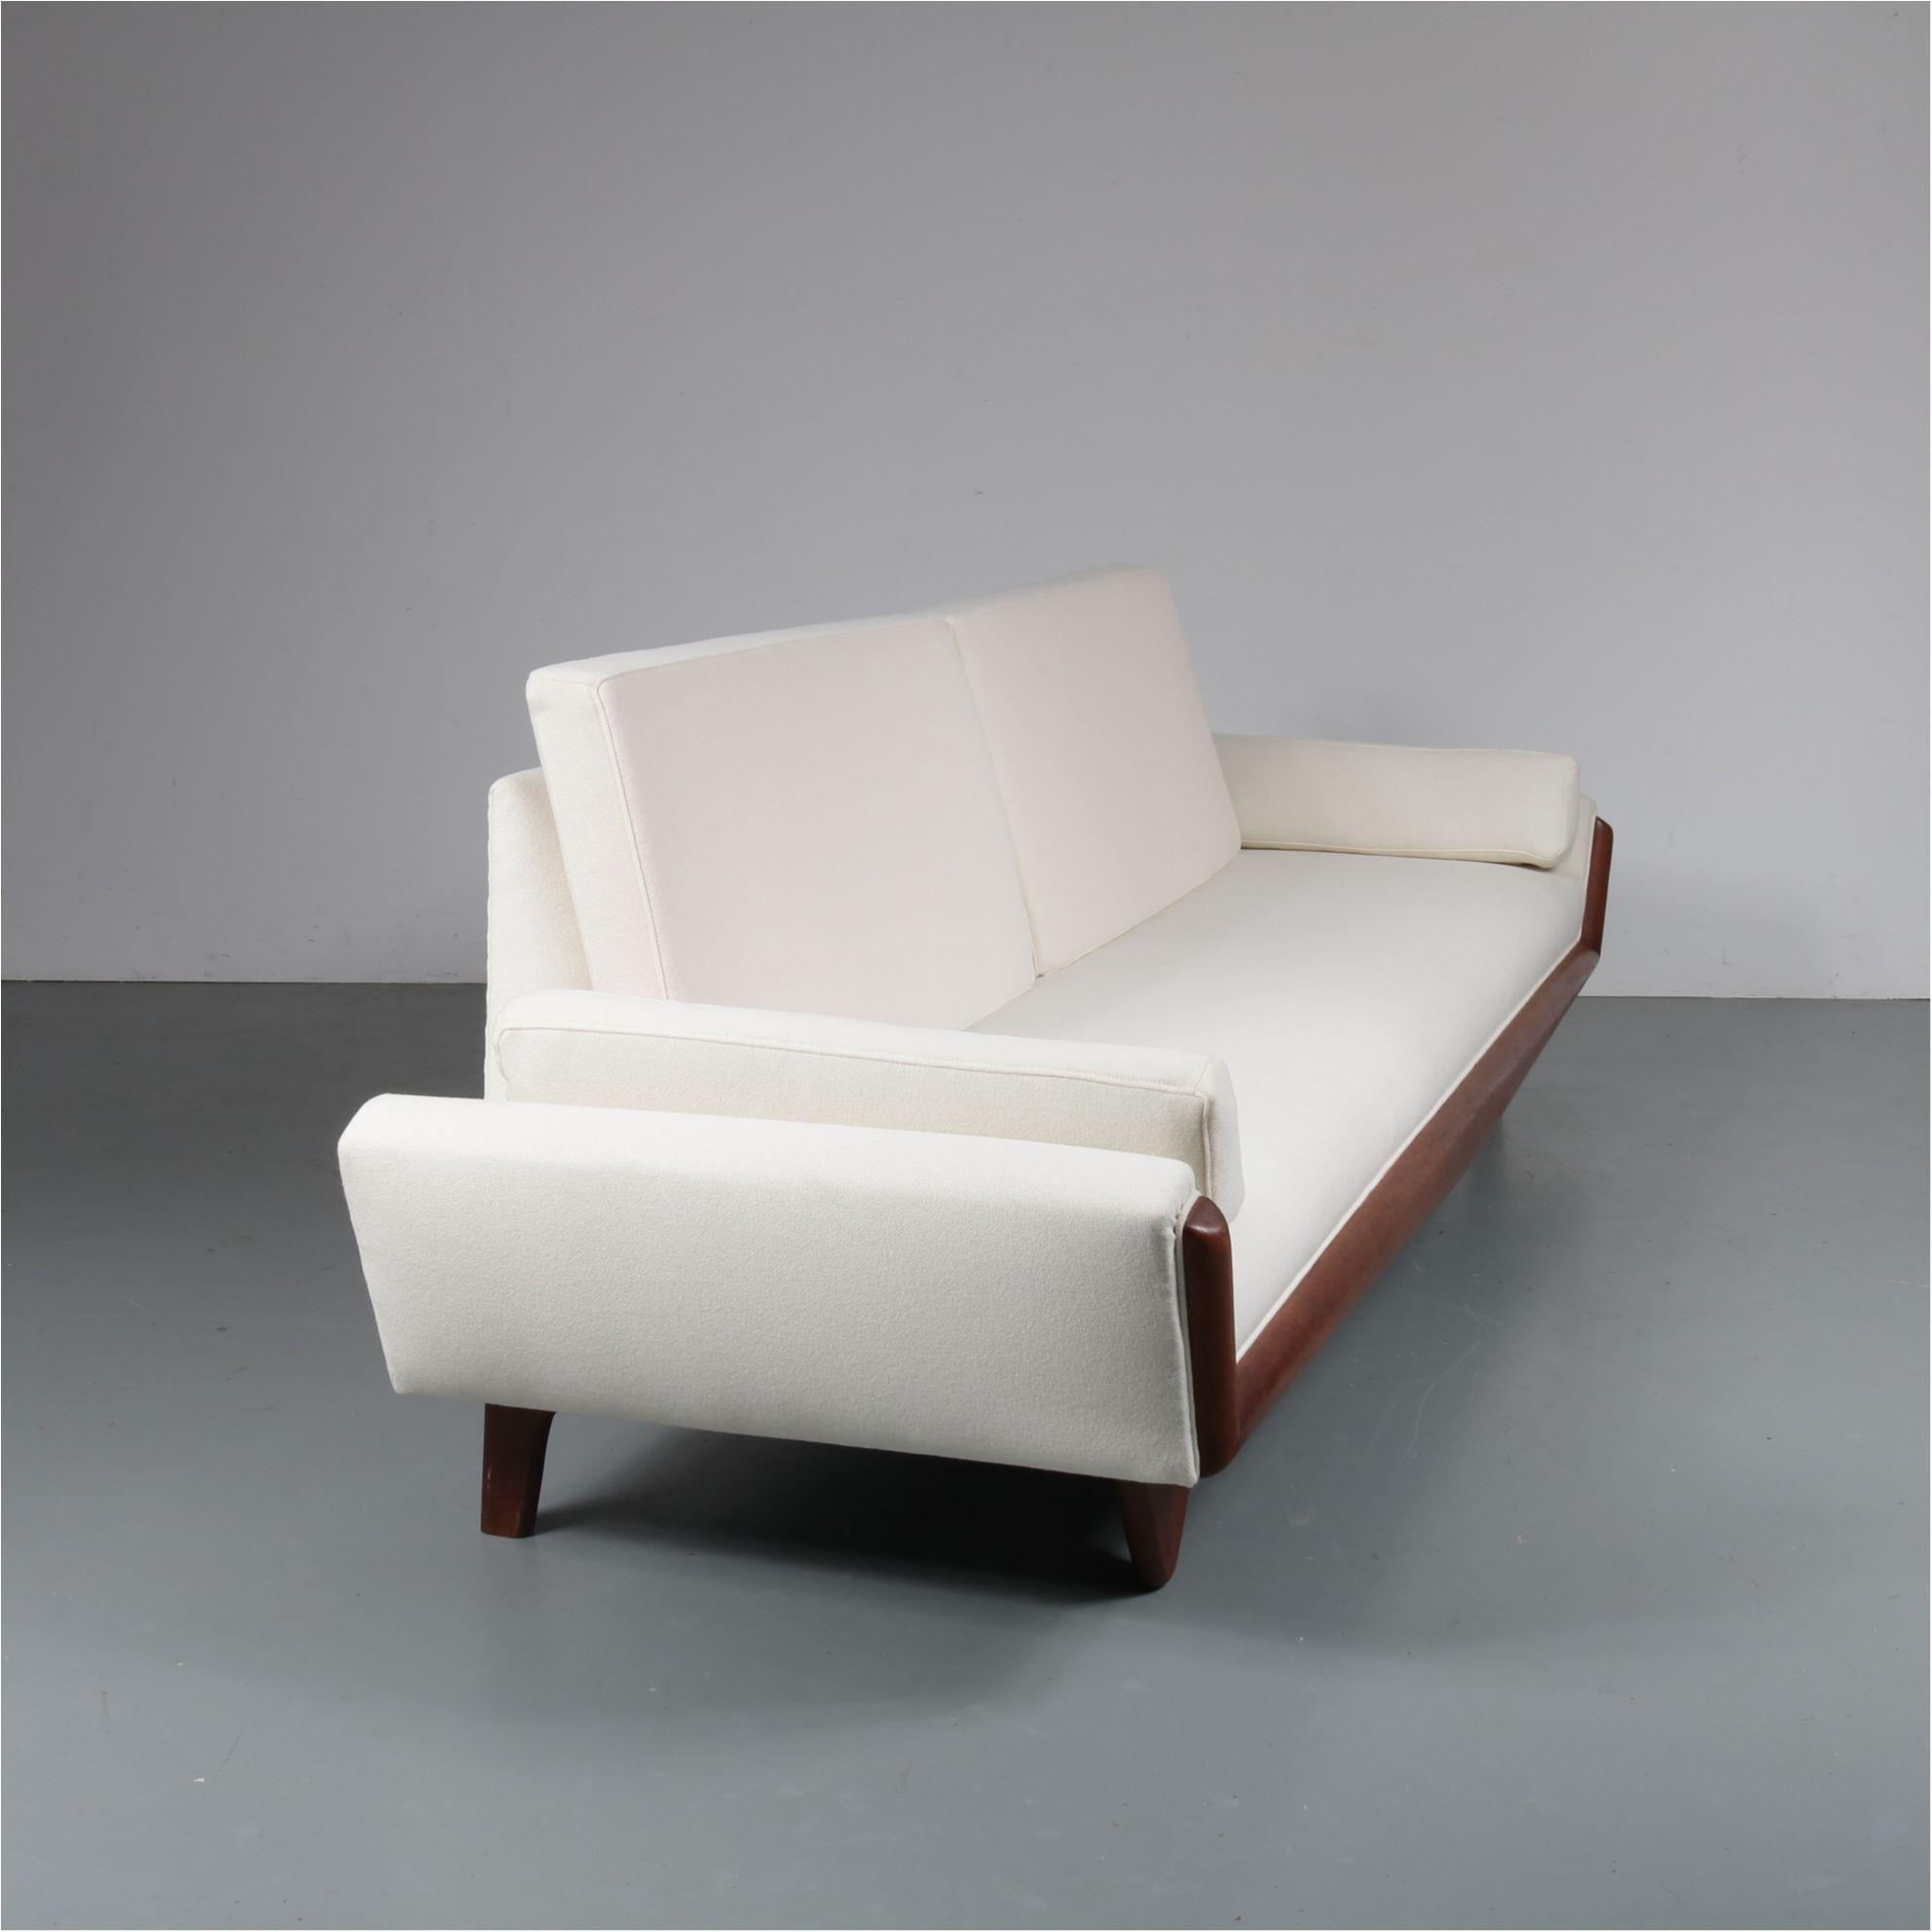 Stupendous Adrian Pearsall Gondola Sofa For Craft Associates Usa 1960S Creativecarmelina Interior Chair Design Creativecarmelinacom